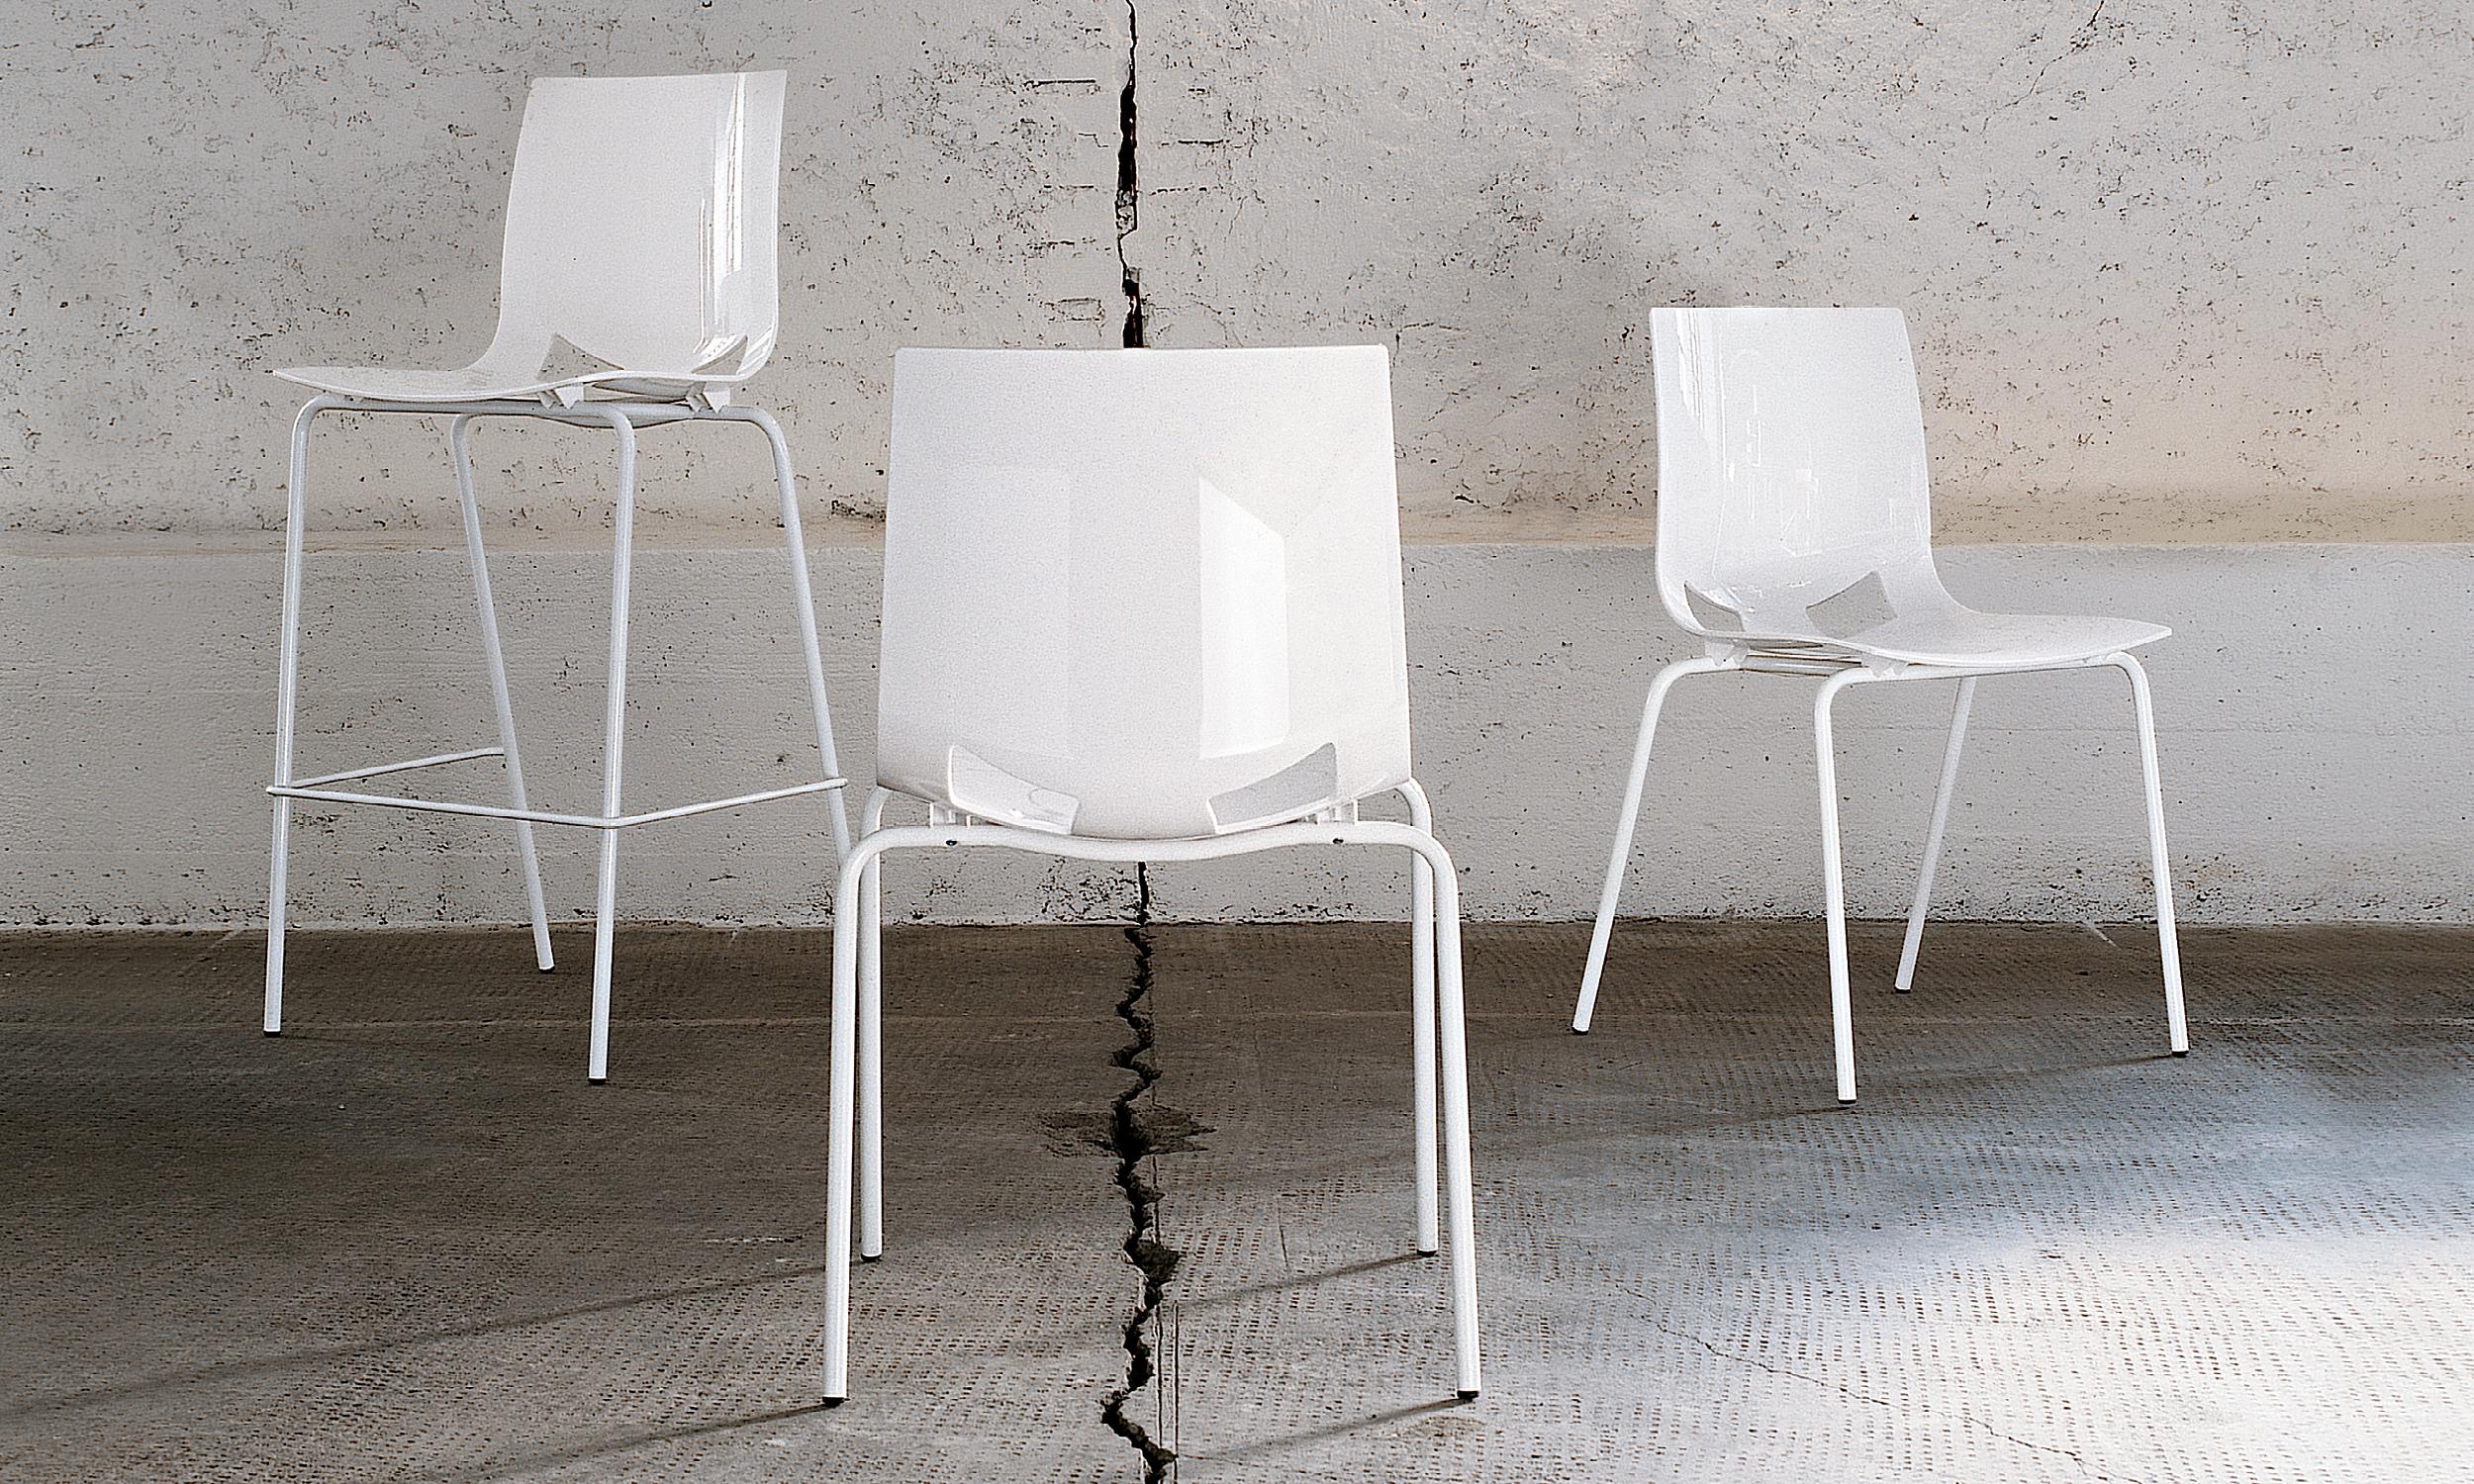 office-chairs_10-6_Verbena-4.jpg